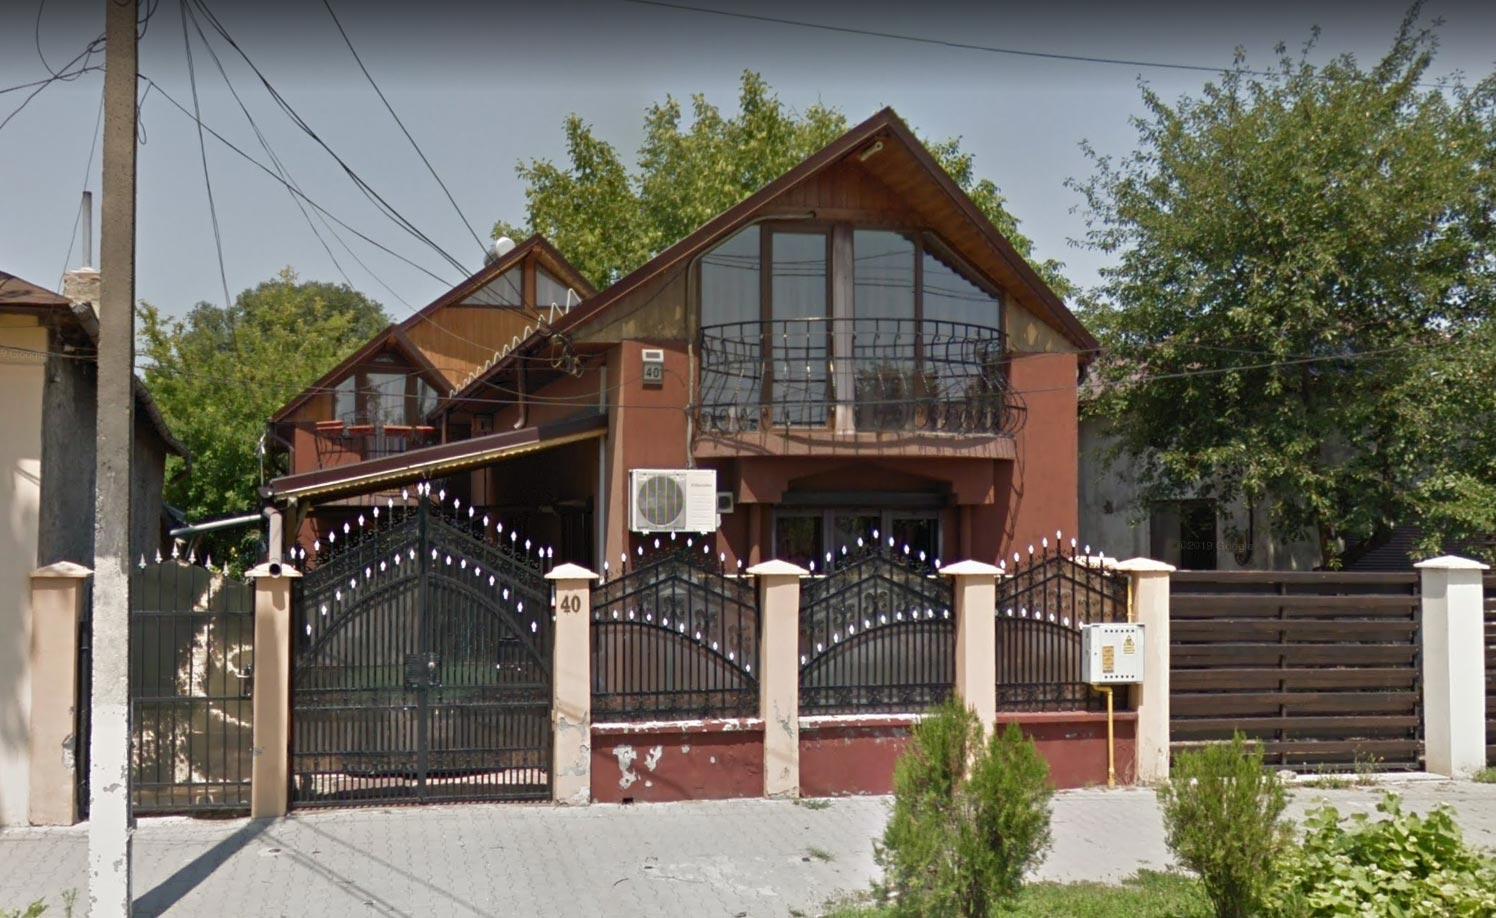 Casa P+M 114mp + teren intravilan 170mp, Giurgiu, jud. Giurgiu